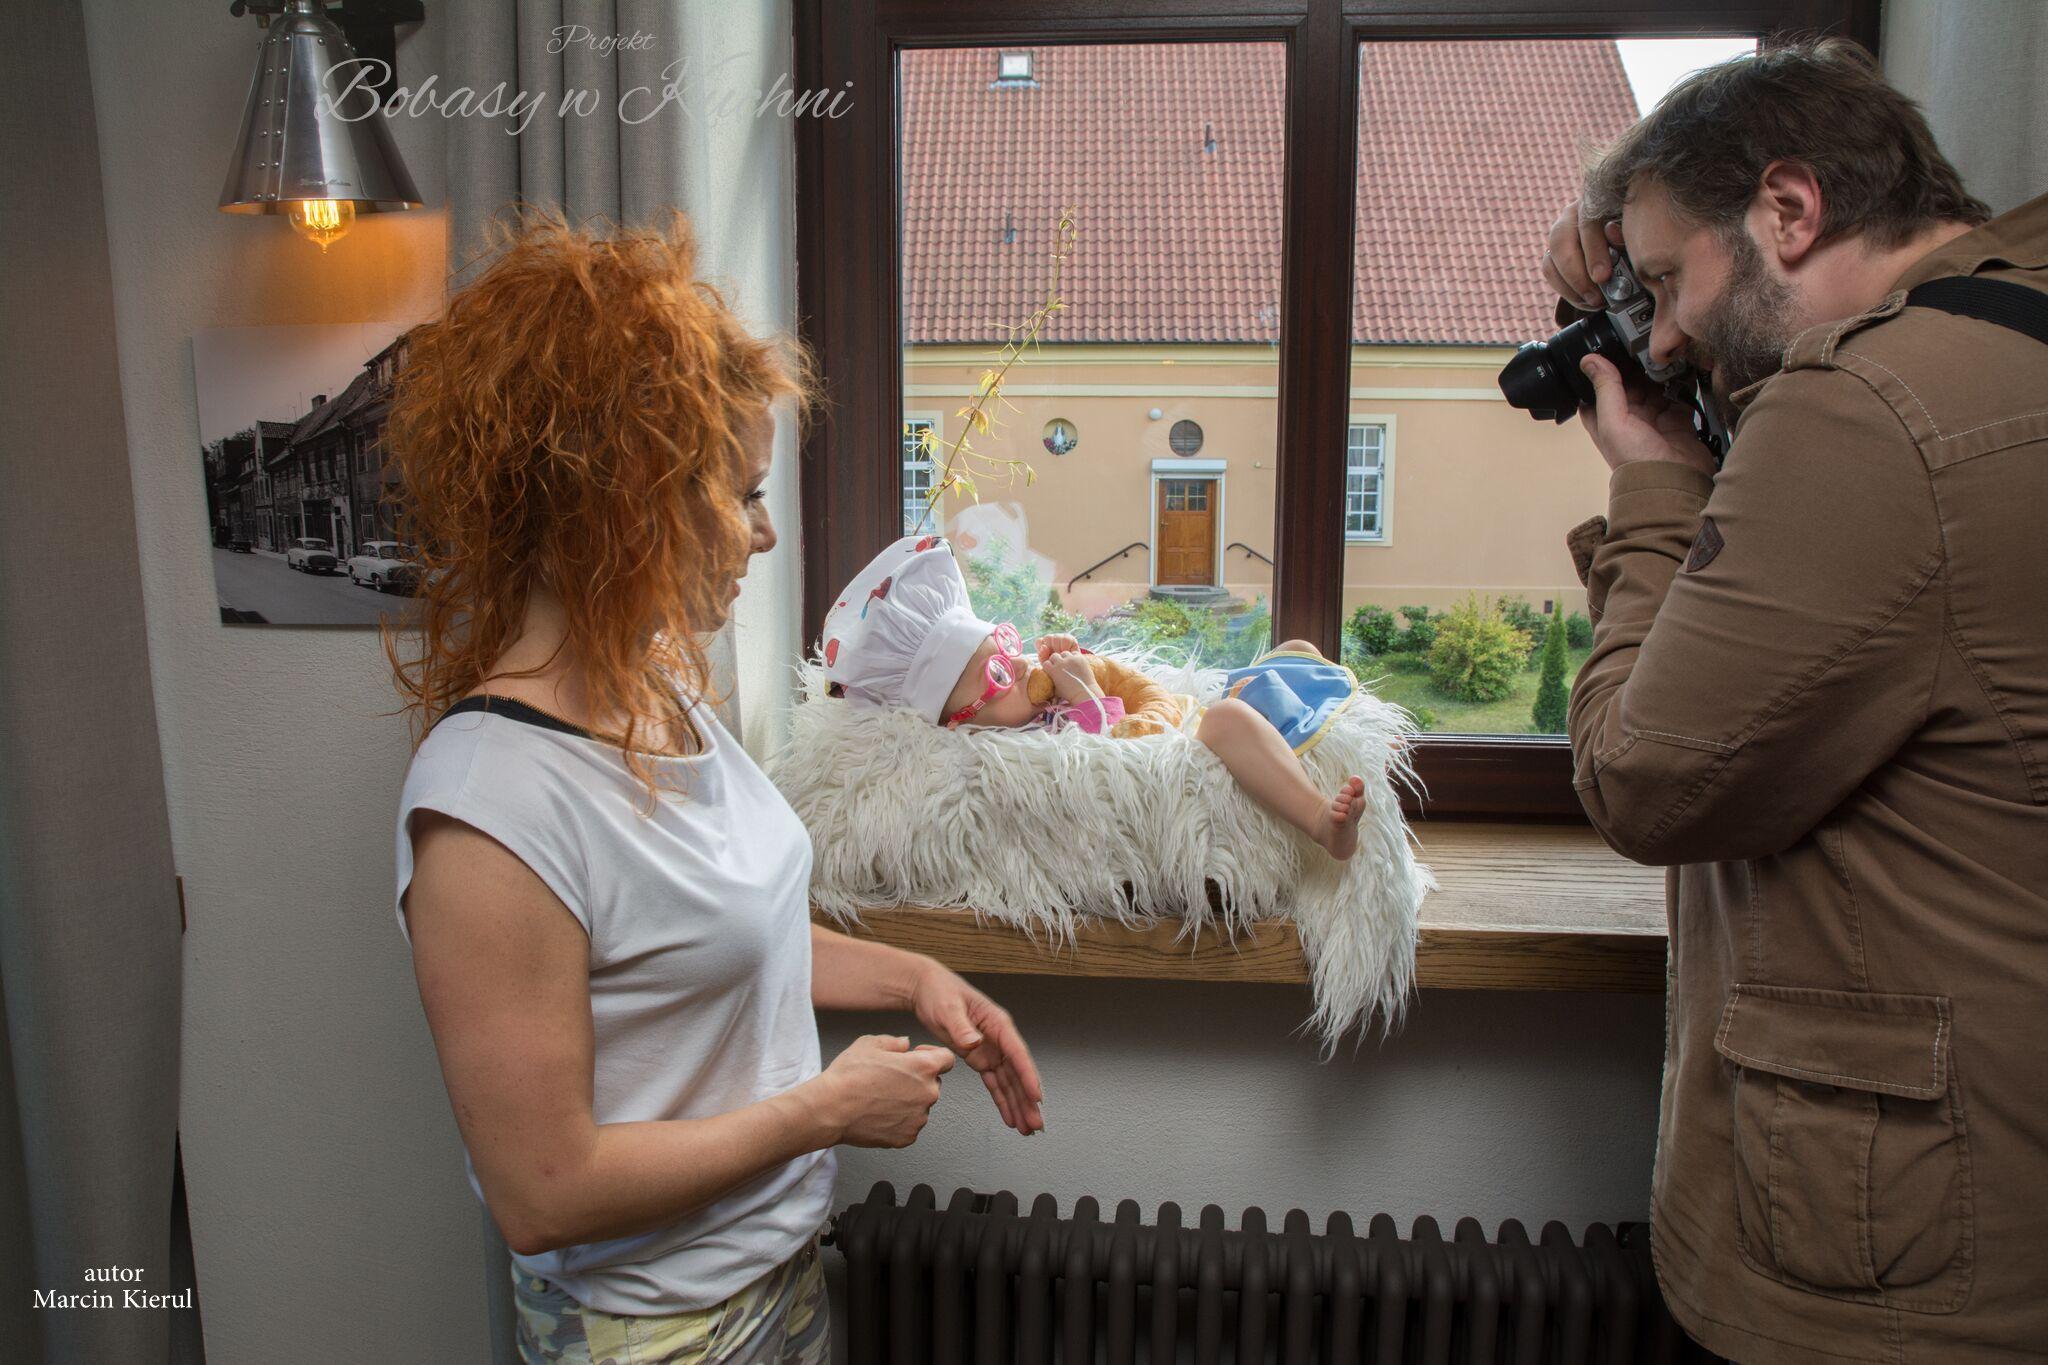 1 jpg Nadia Marcin Kierul projekt Bobasy w Kuchni. 5jpg